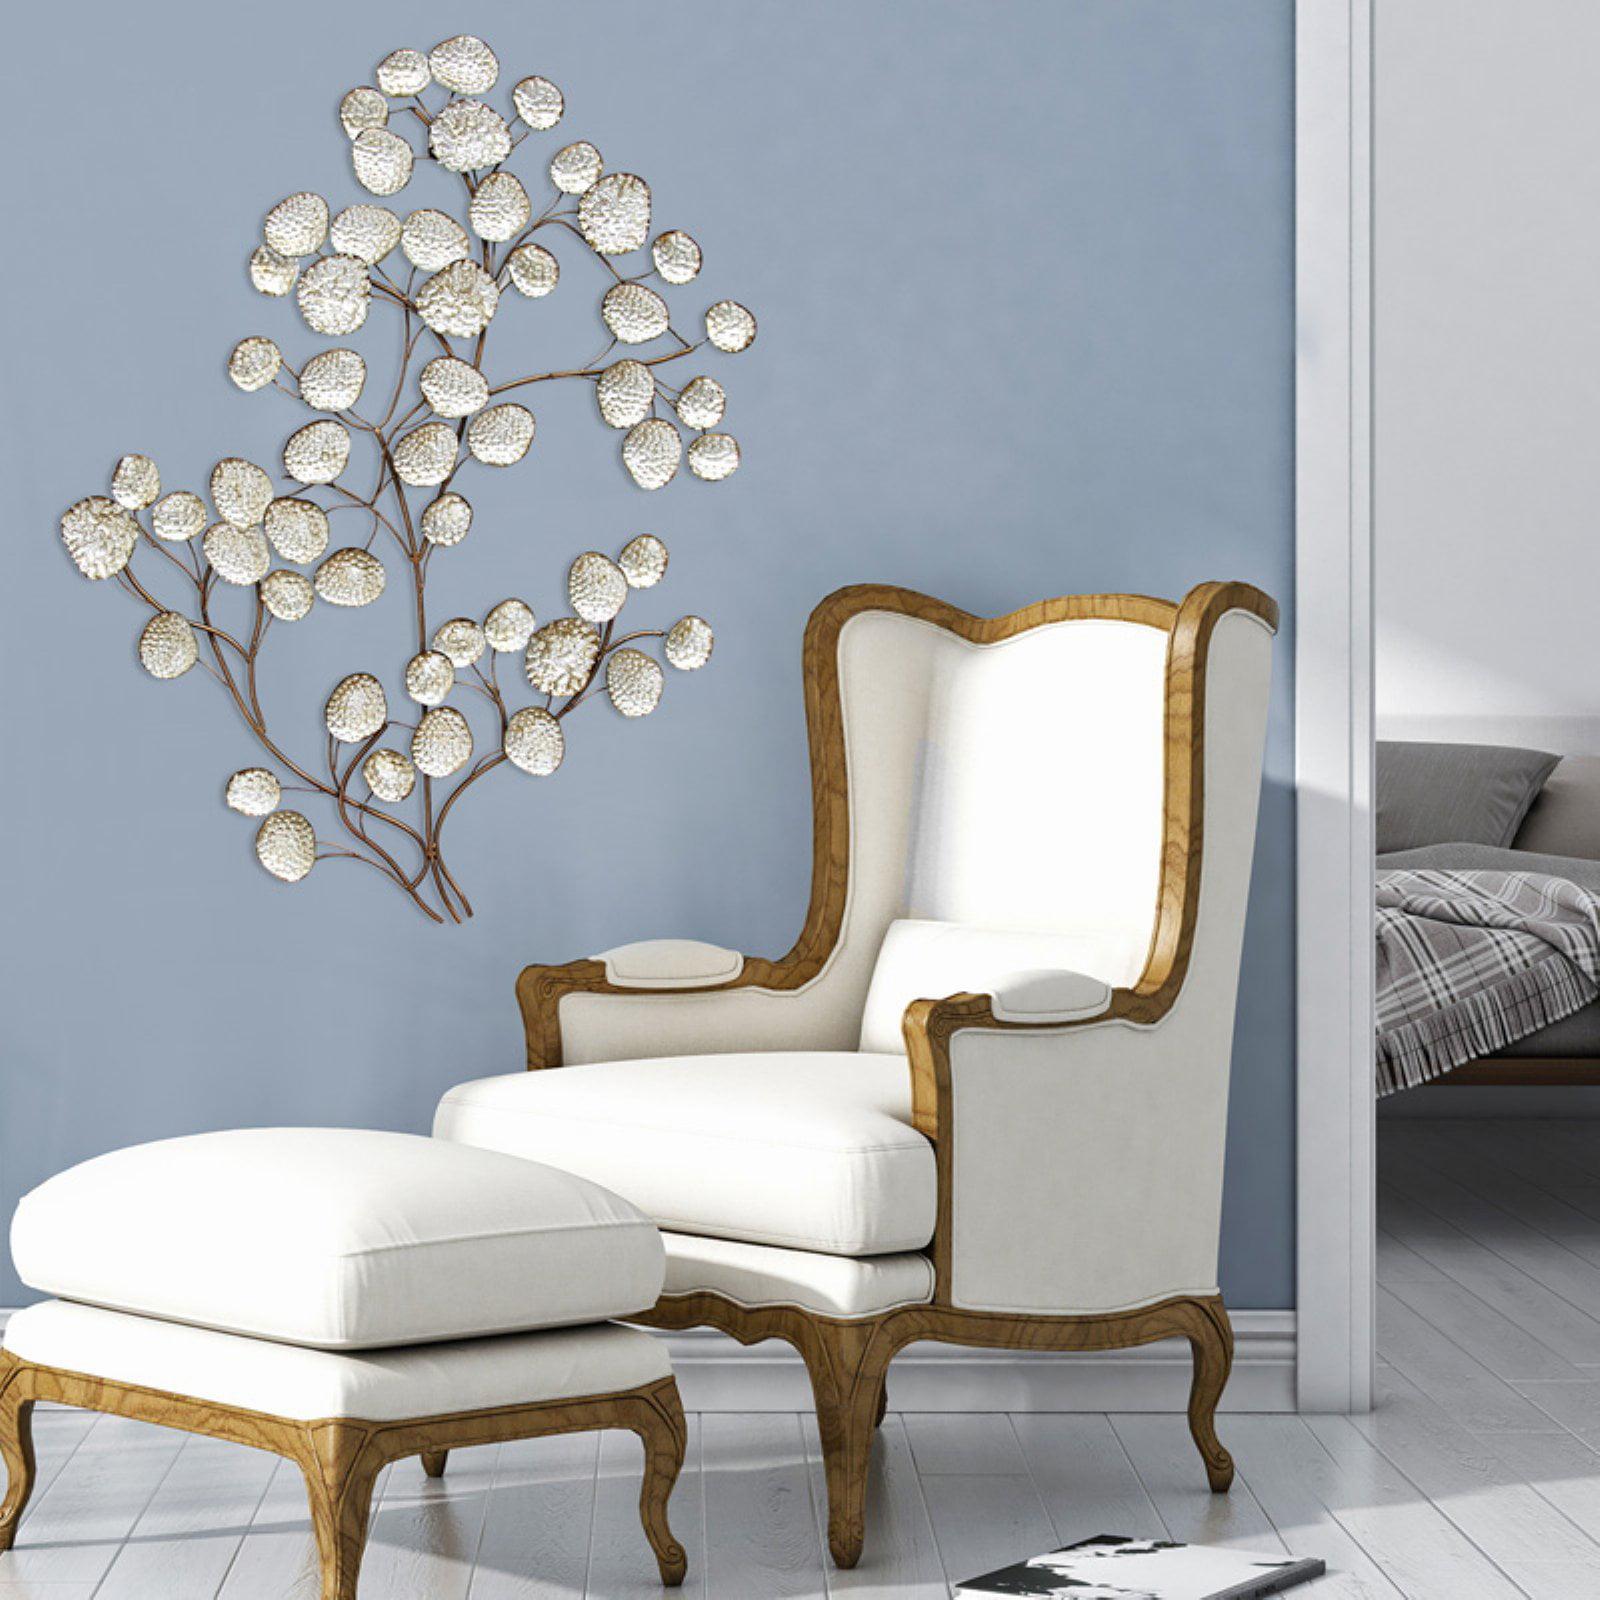 Stratton Home Decor Silver Textured Leaf Wall Decor by Stratton Home Decor